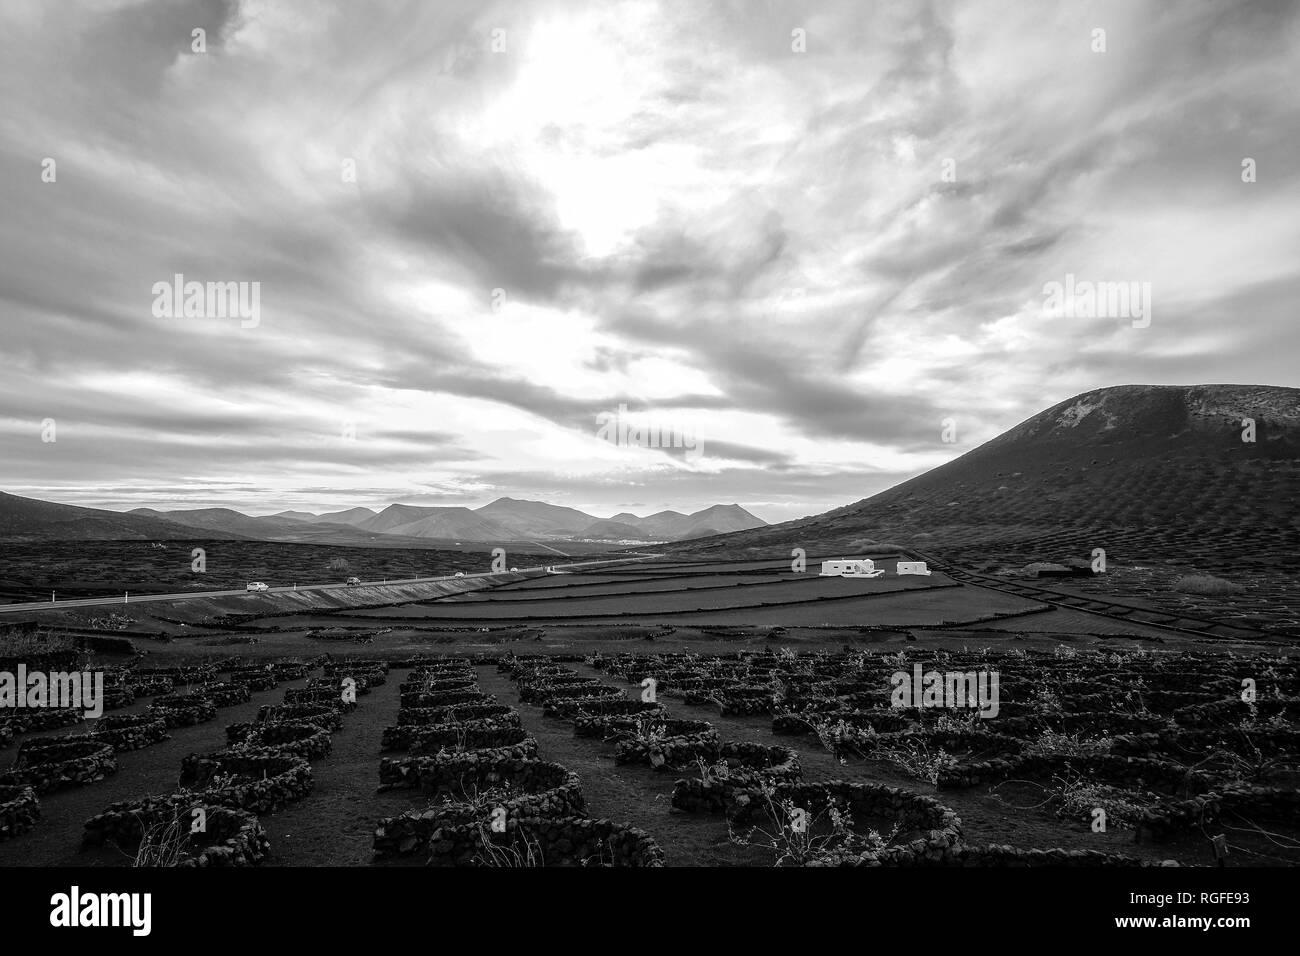 Wine-growing region of La Geria. - Stock Image